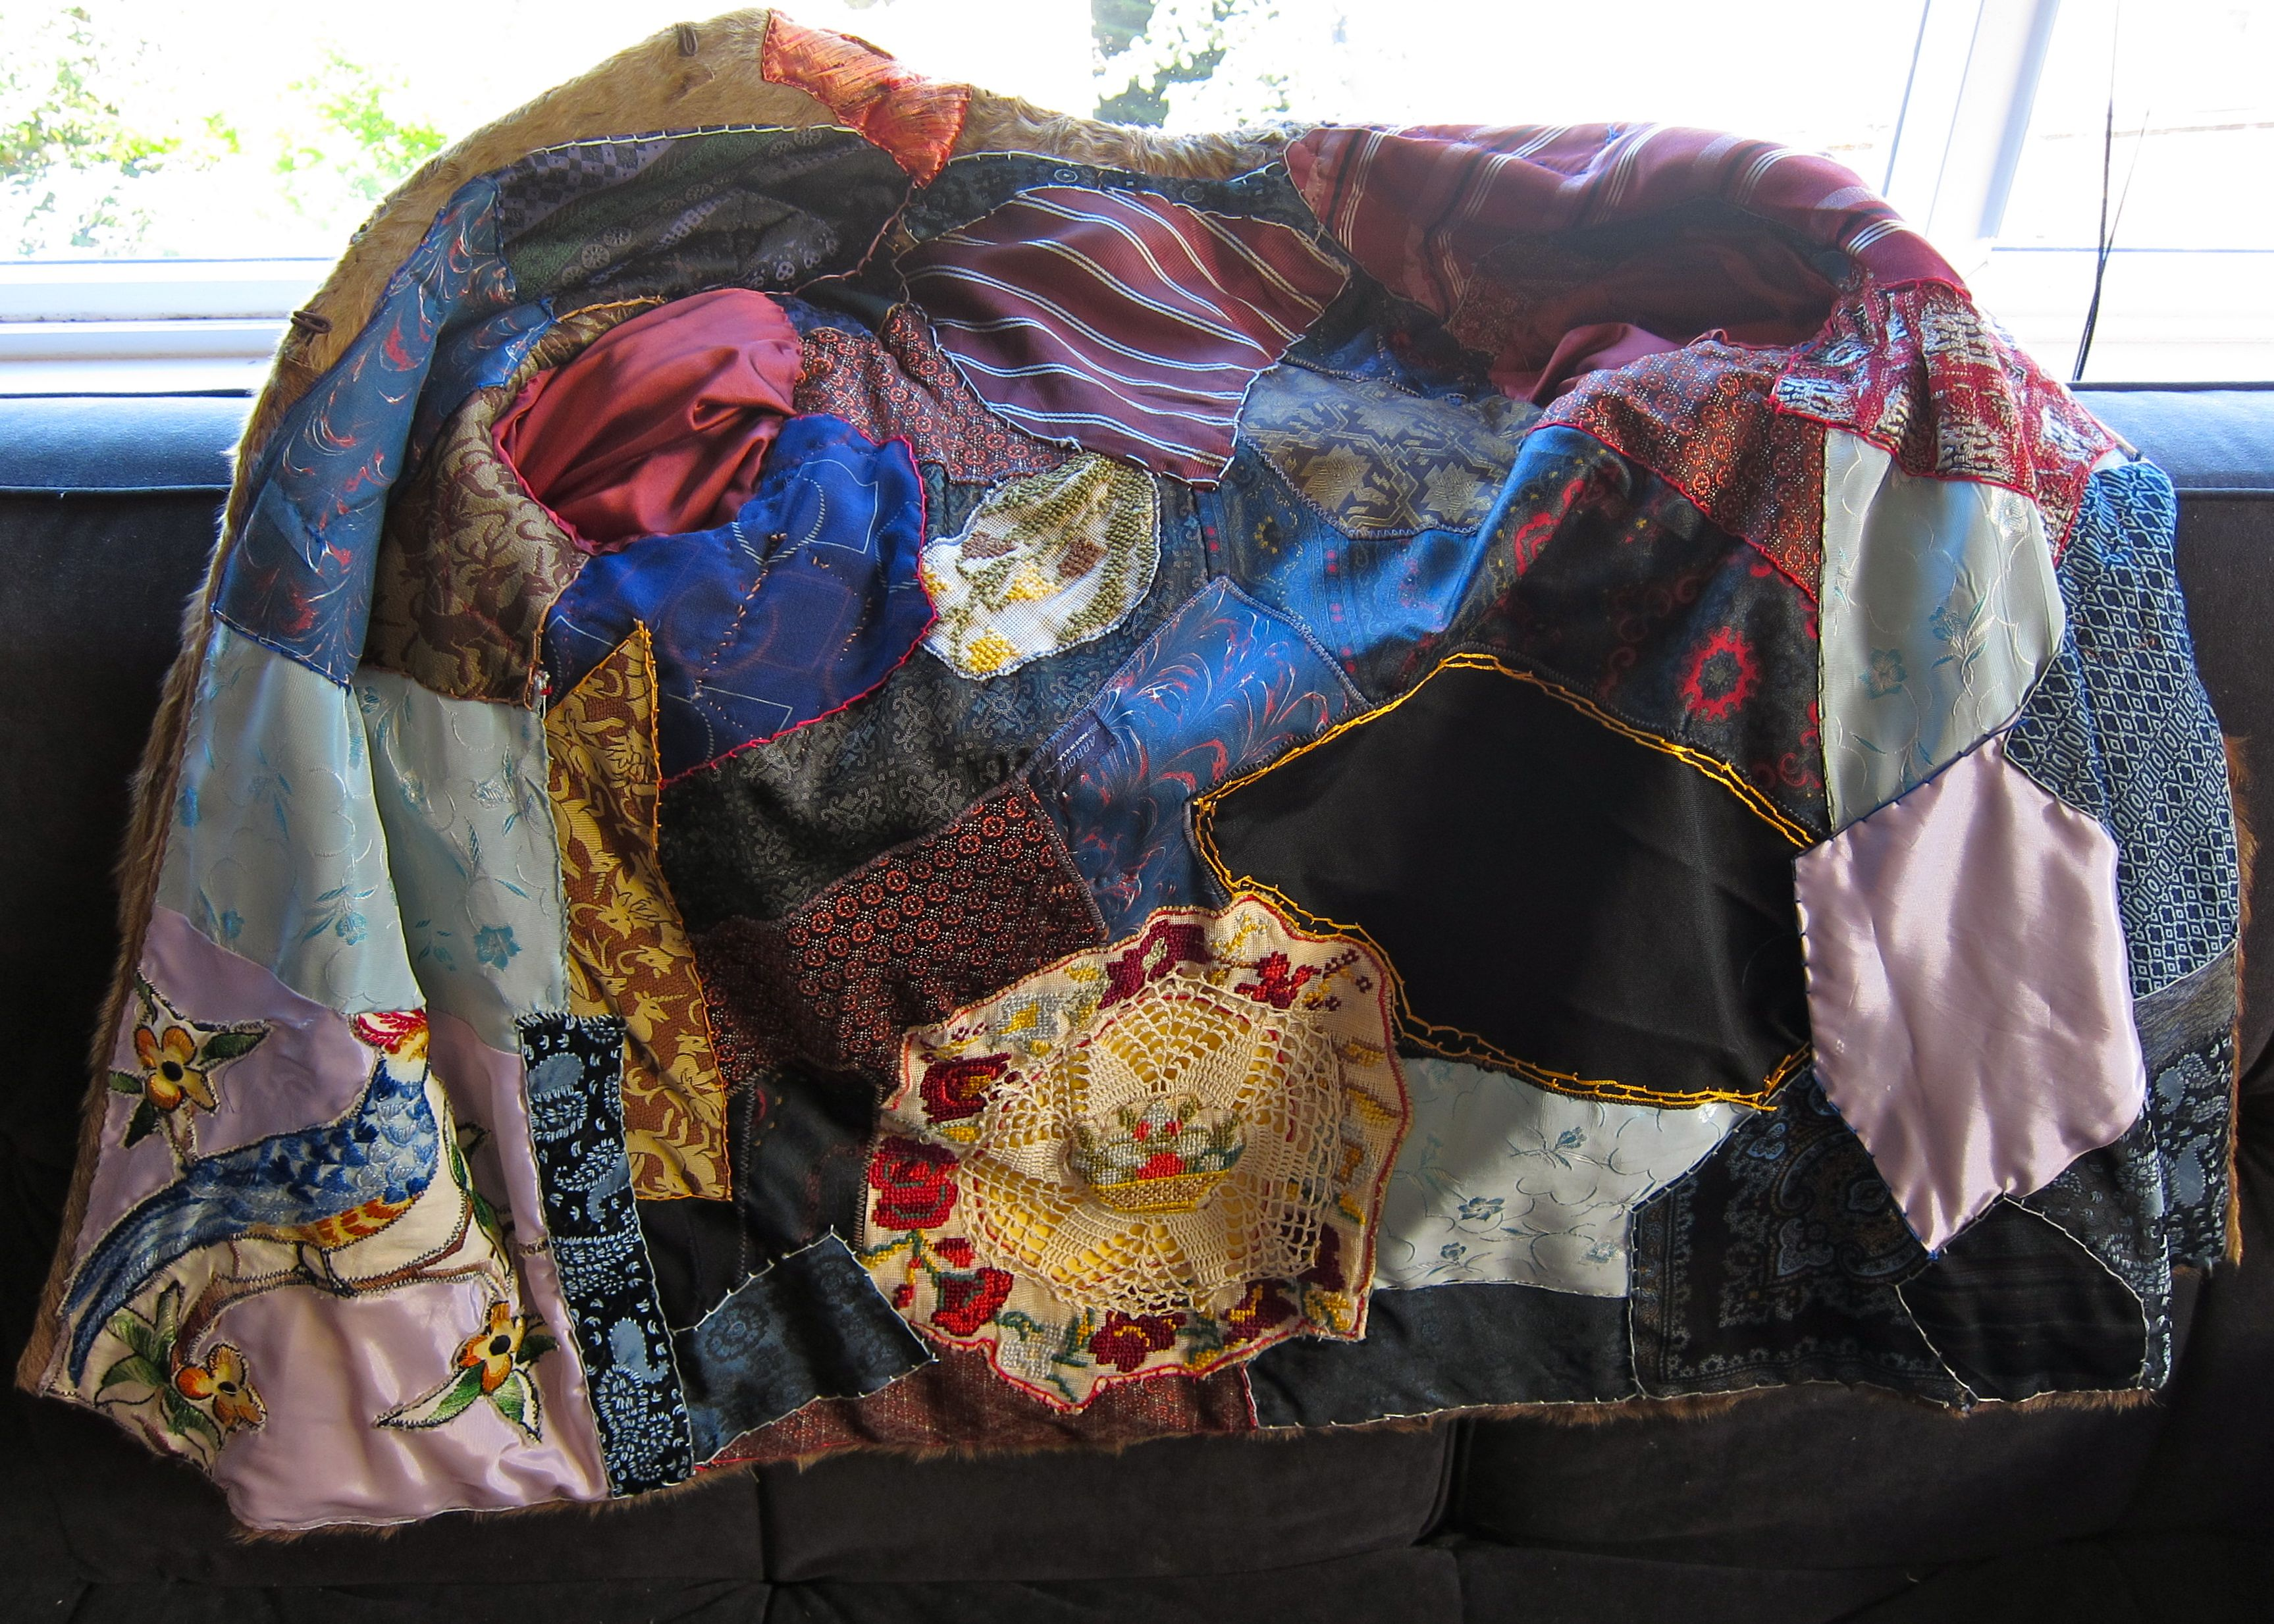 The Amazing Lining Side of the Janis Joplin Jacket